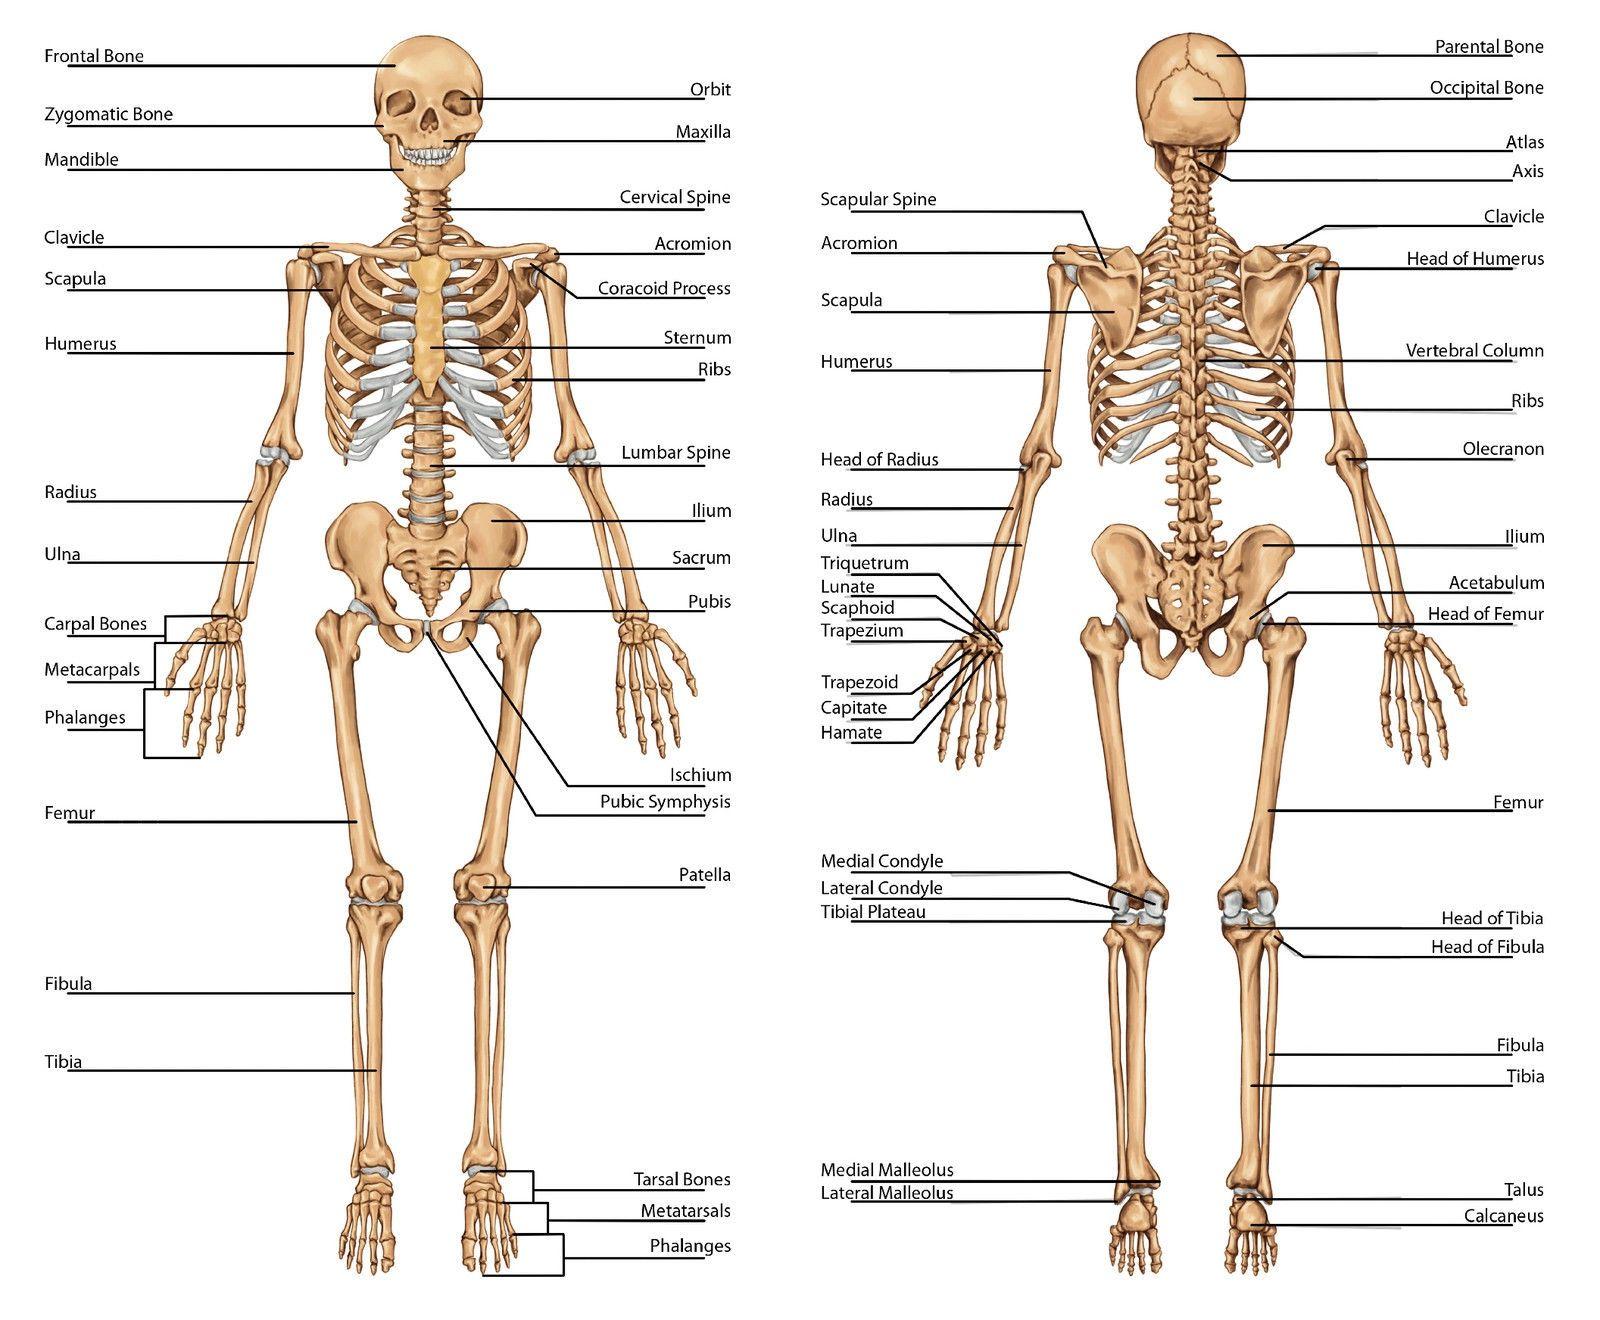 anatomy of the bones in your body skeleton bones human skeleton anatomy bones diagram human anatomy [ 1600 x 1320 Pixel ]